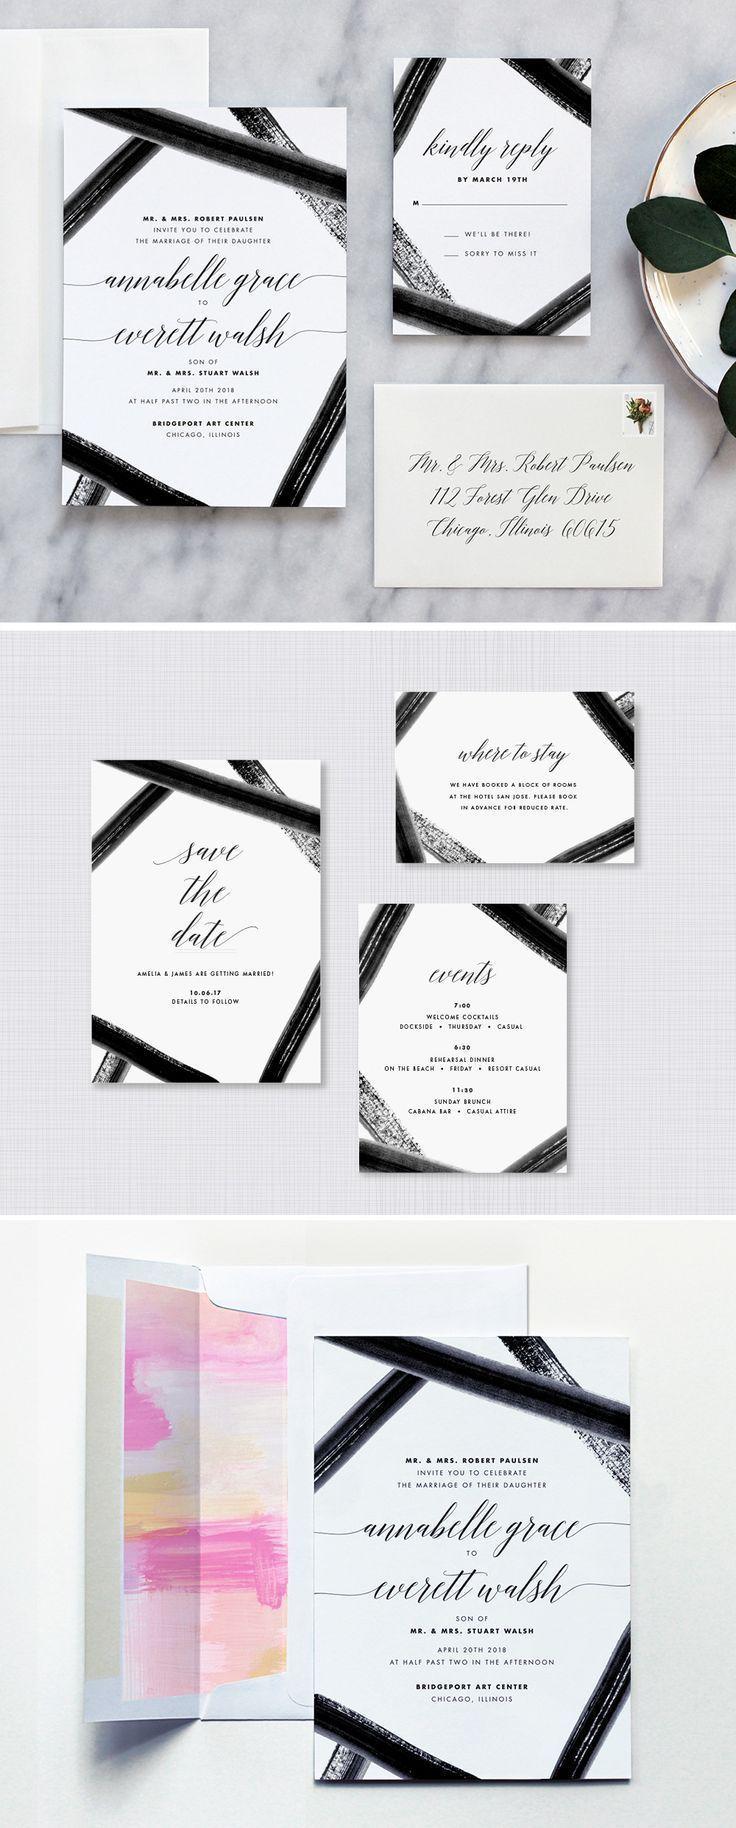 Black Tie Watercolor Wedding Invitations | Modern calligraphy ...